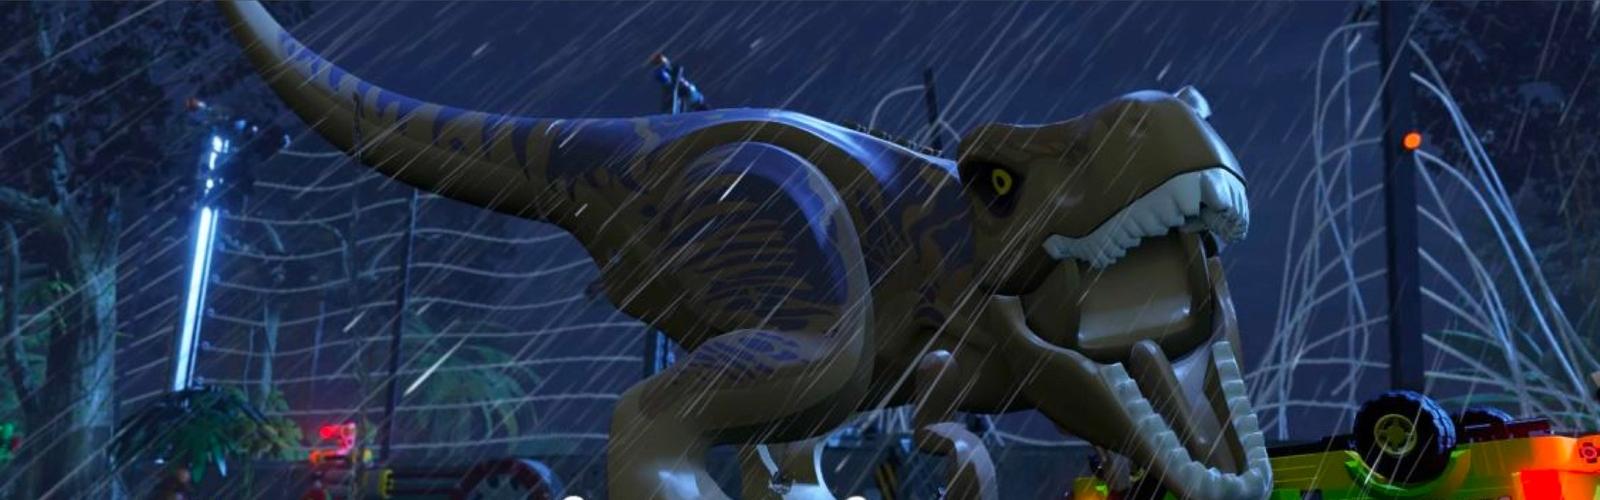 Banner del videojuego Jurassic World